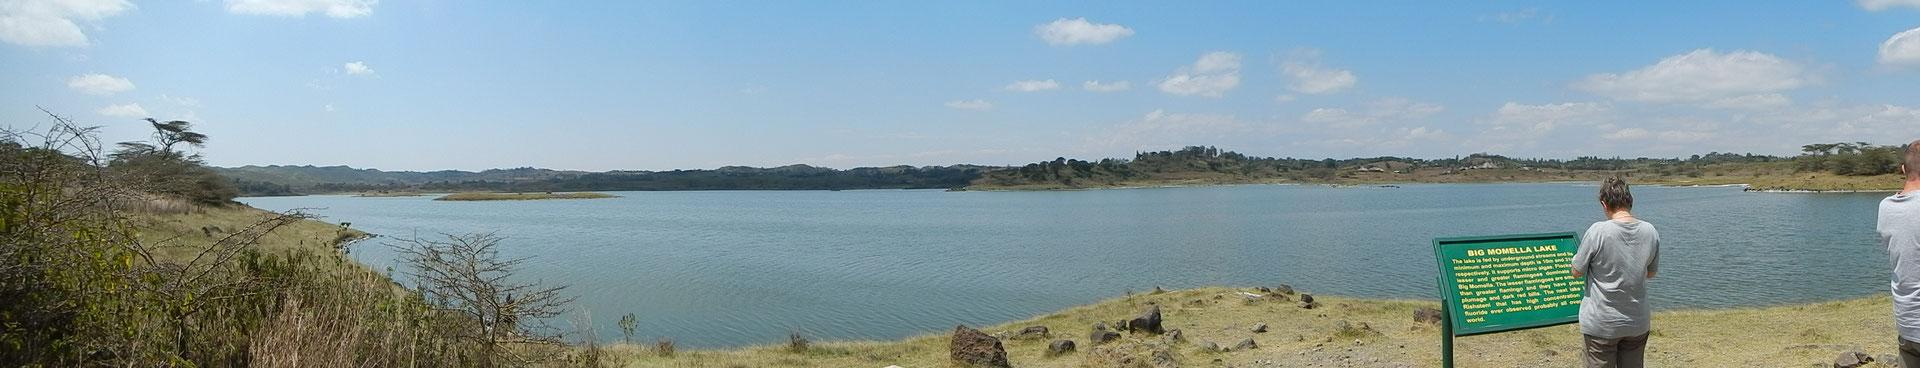 Momella See / Momella Lake